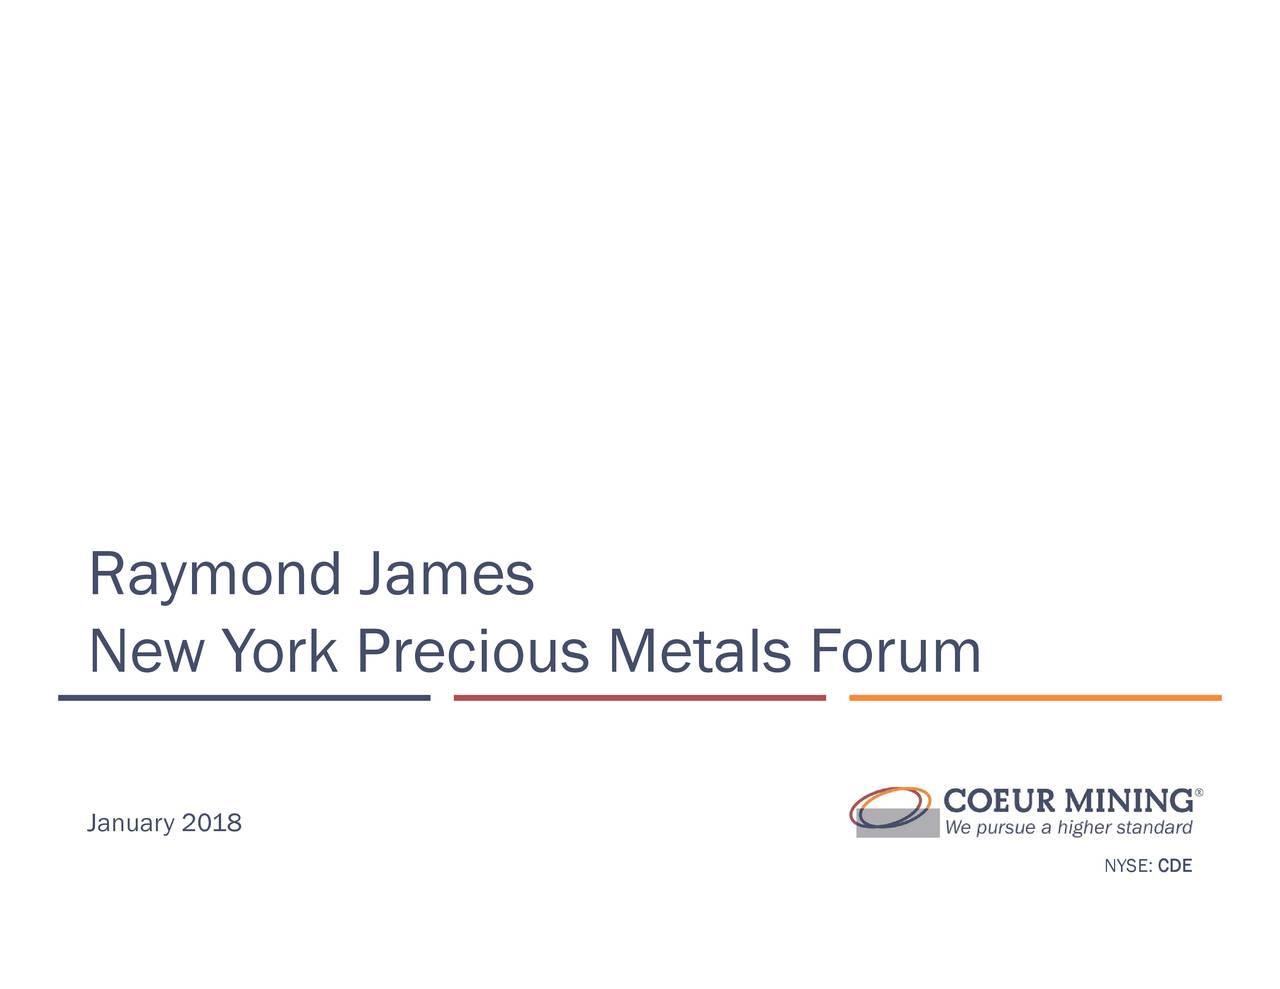 Coeur Mining (CDE) Presents At Precious Metals Forum